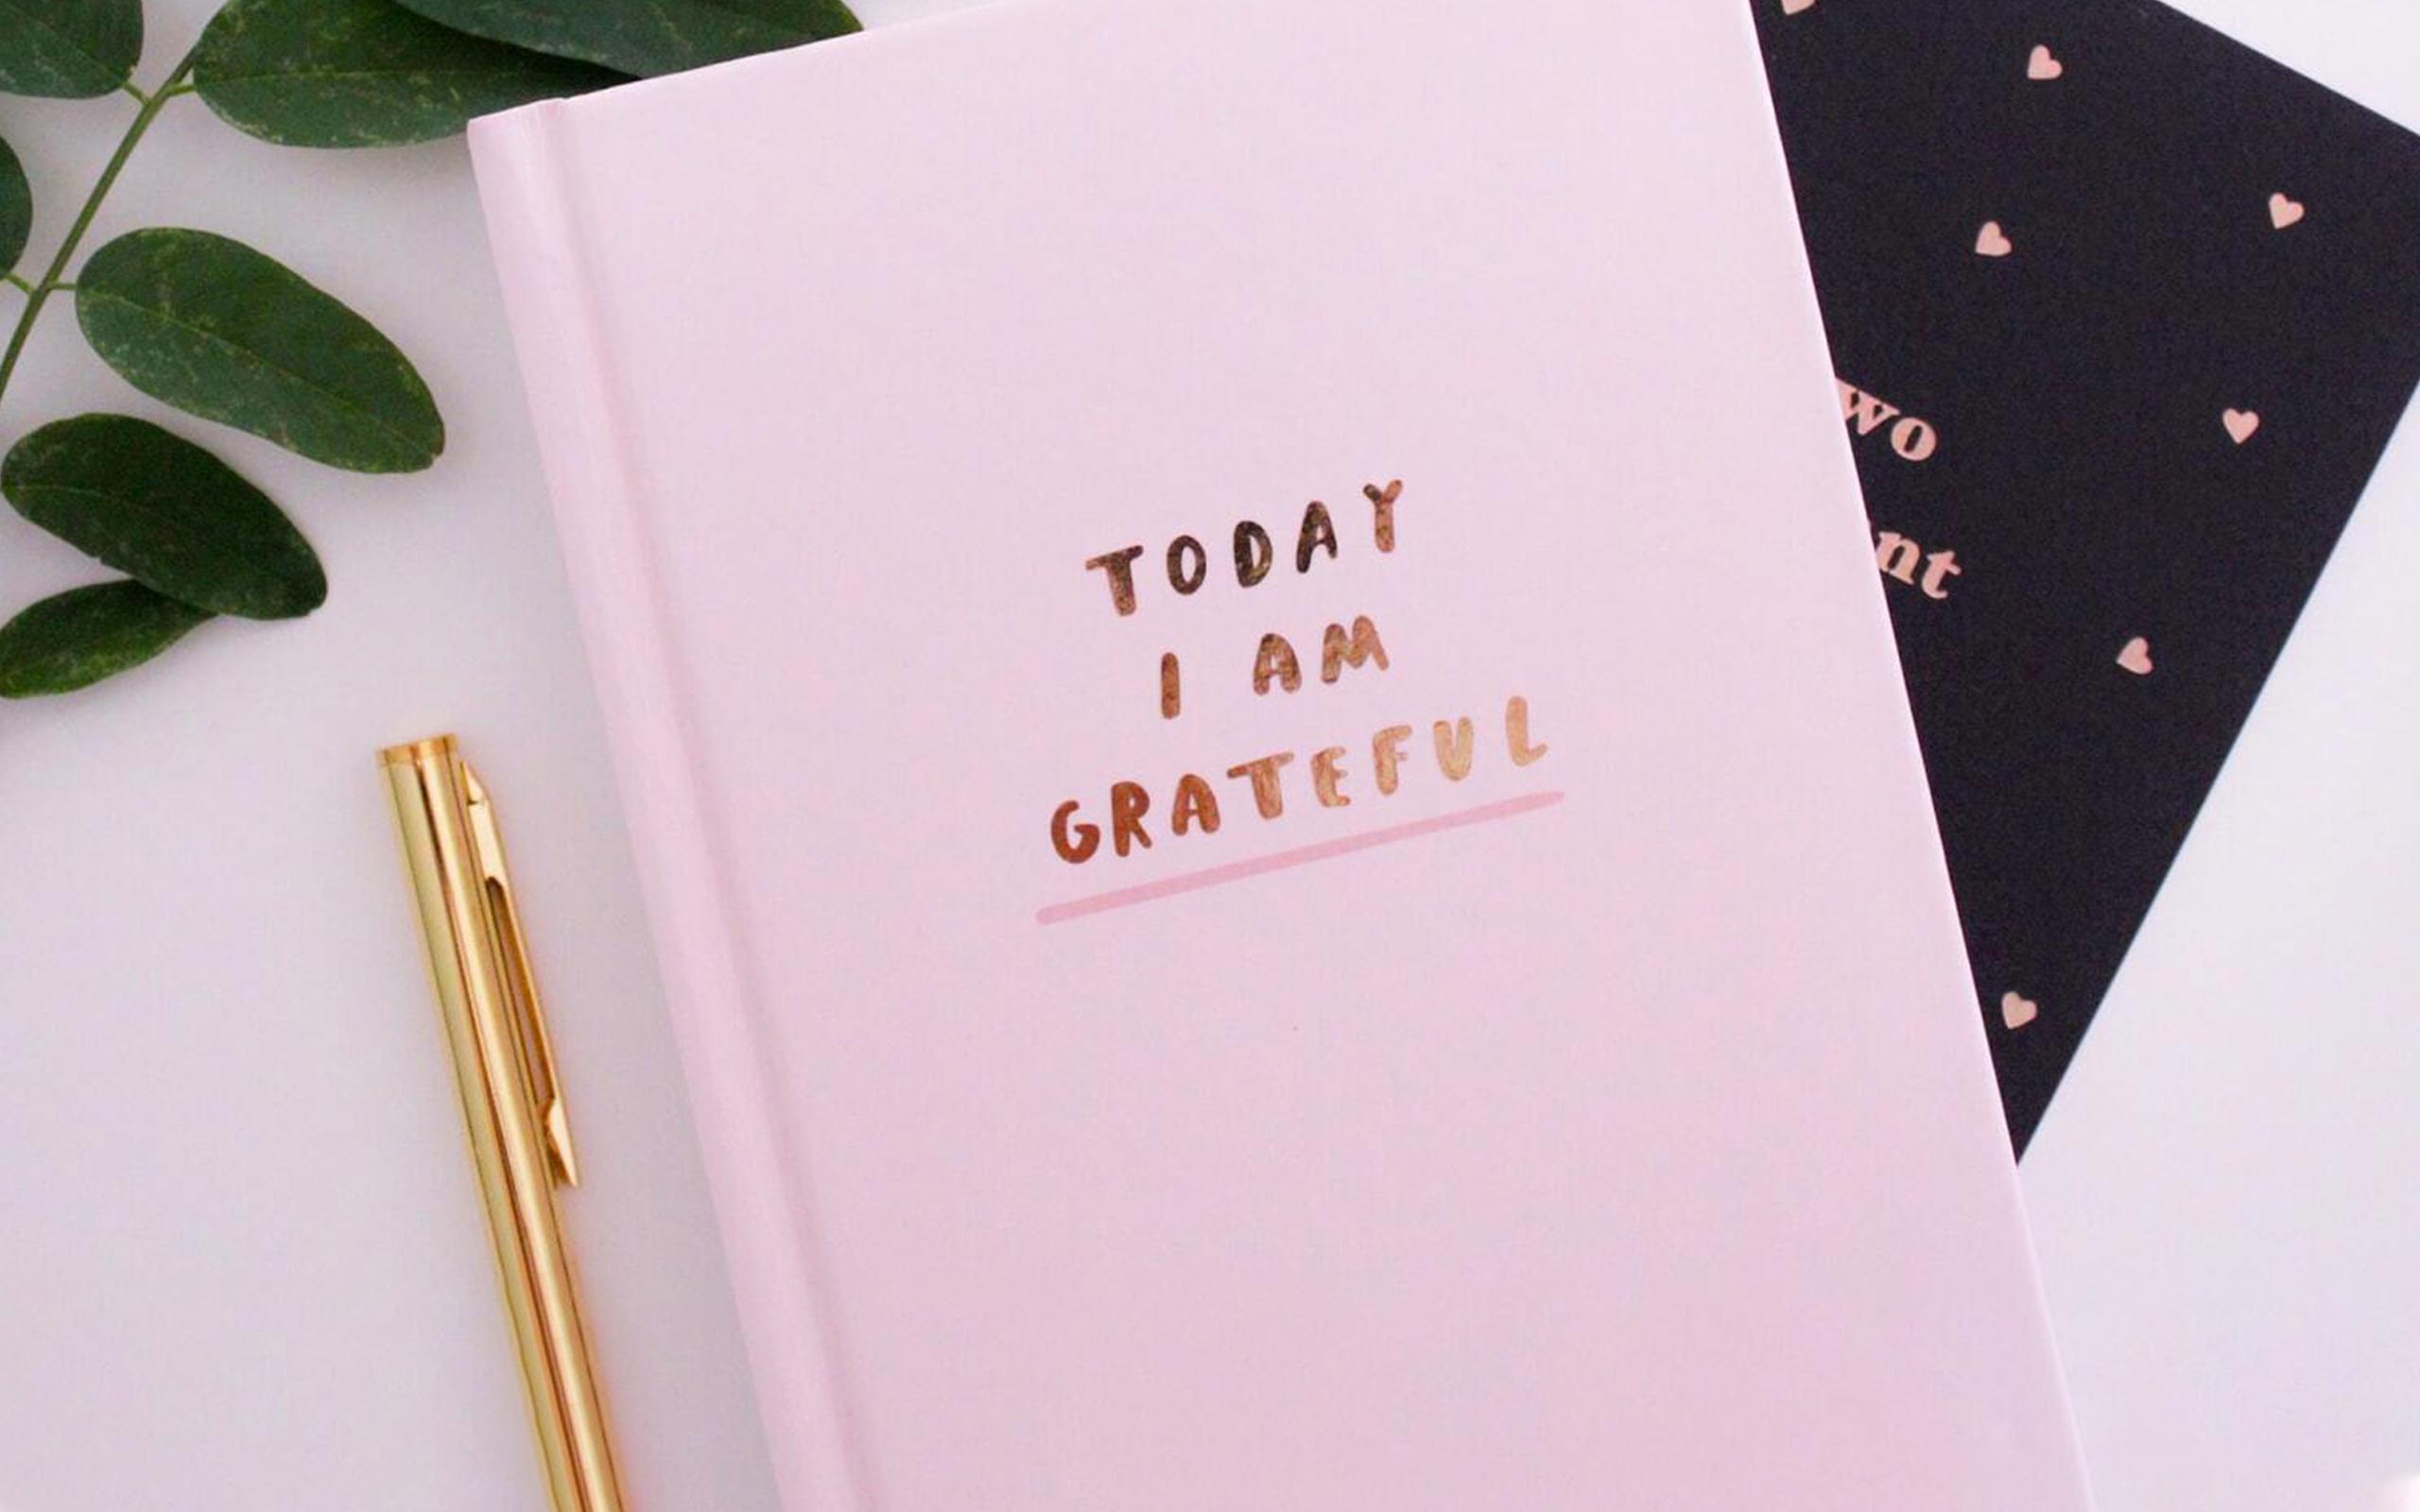 Gratitude Inventory